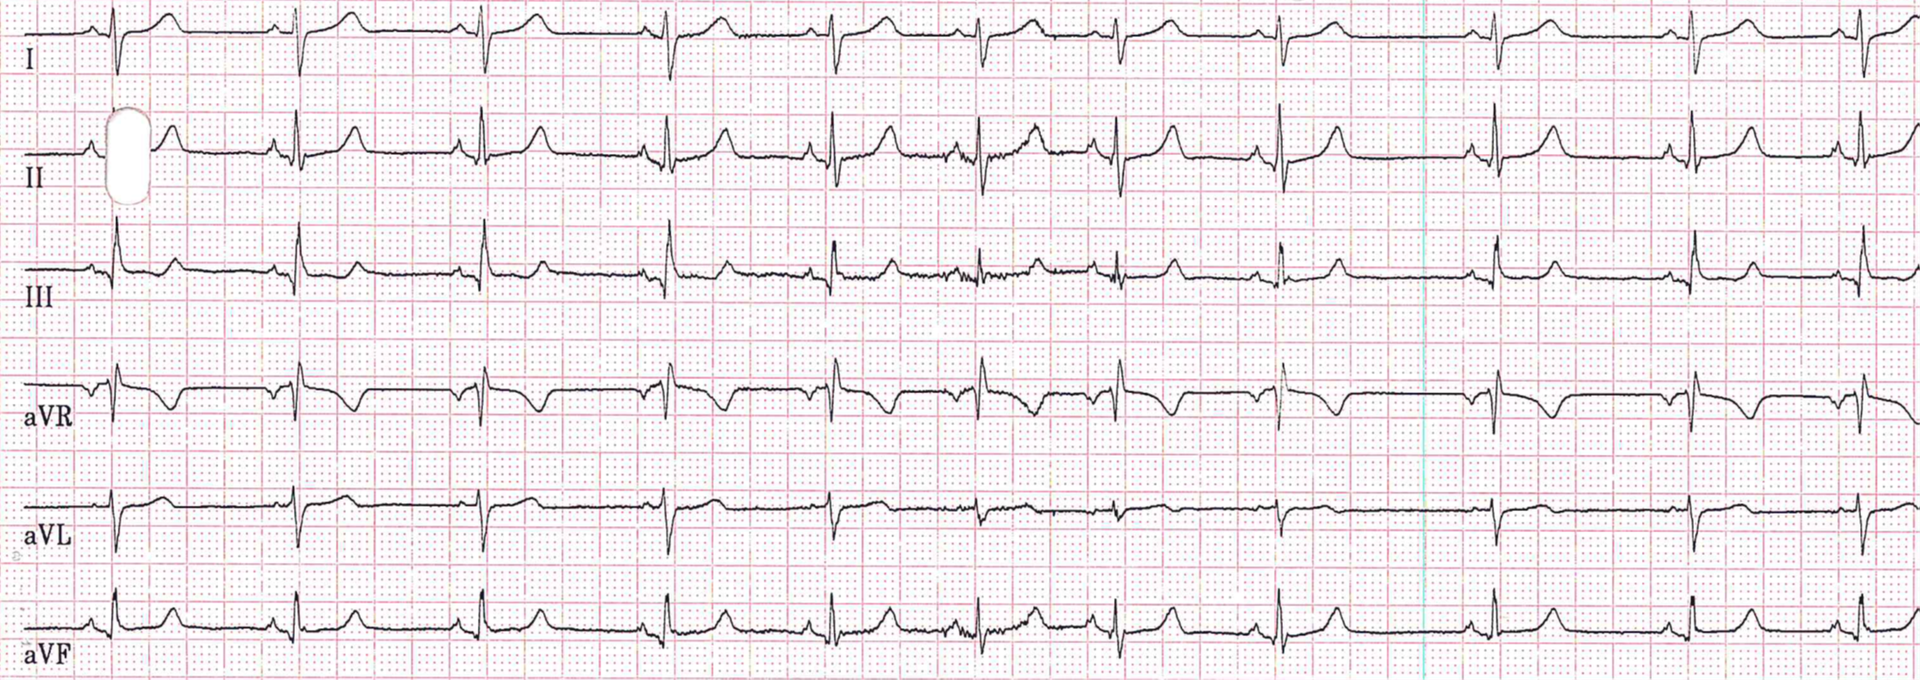 Herzrhythmus Fokus Ekg